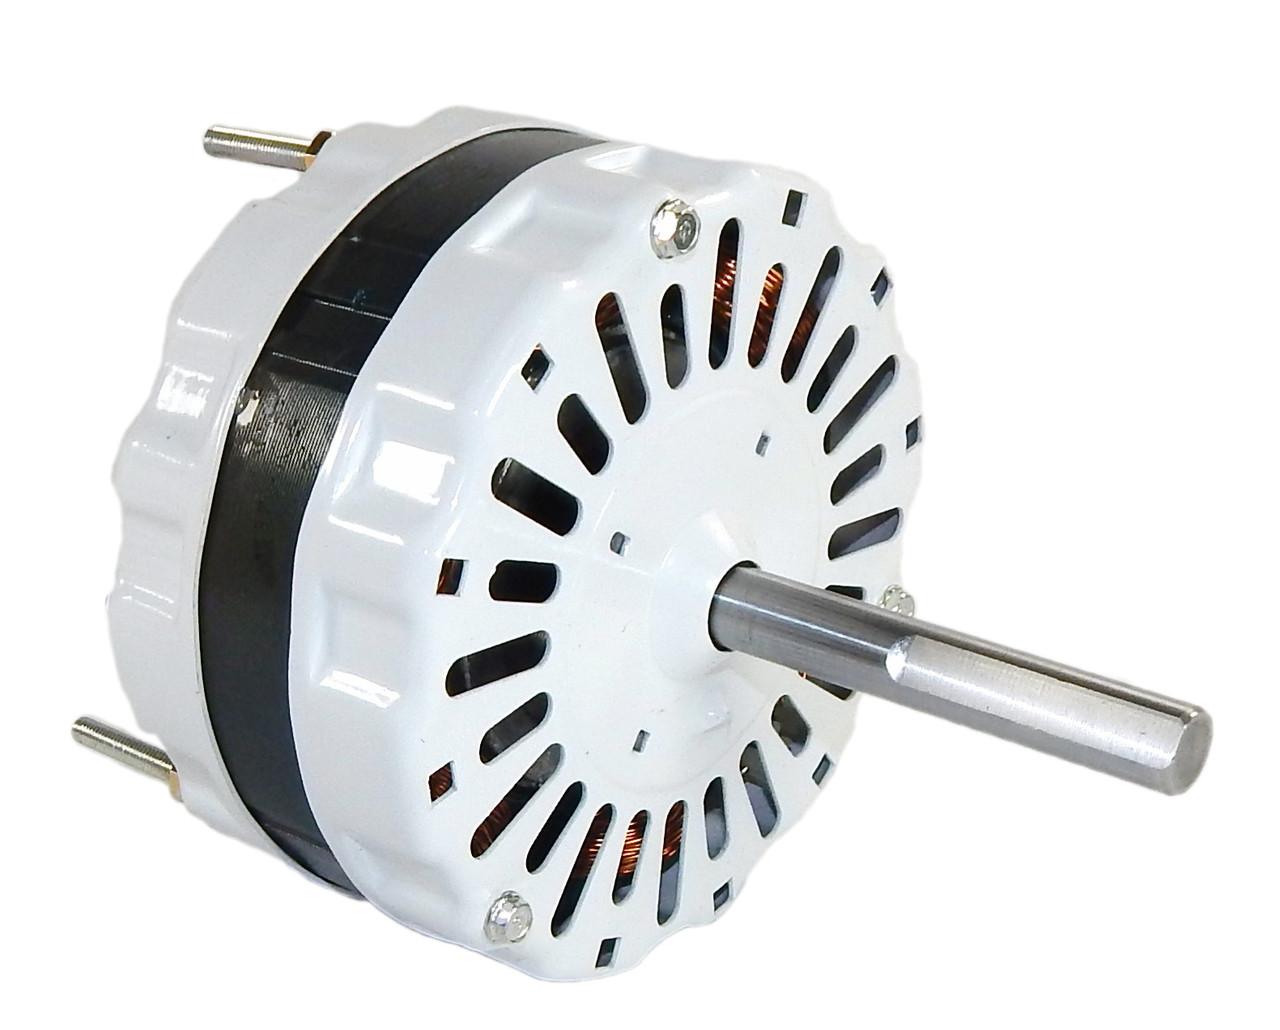 Broan Attic Fan 120 volts 341, 355, 358 Replacement Motor # 97009317 1140 RPM 4.3 amps